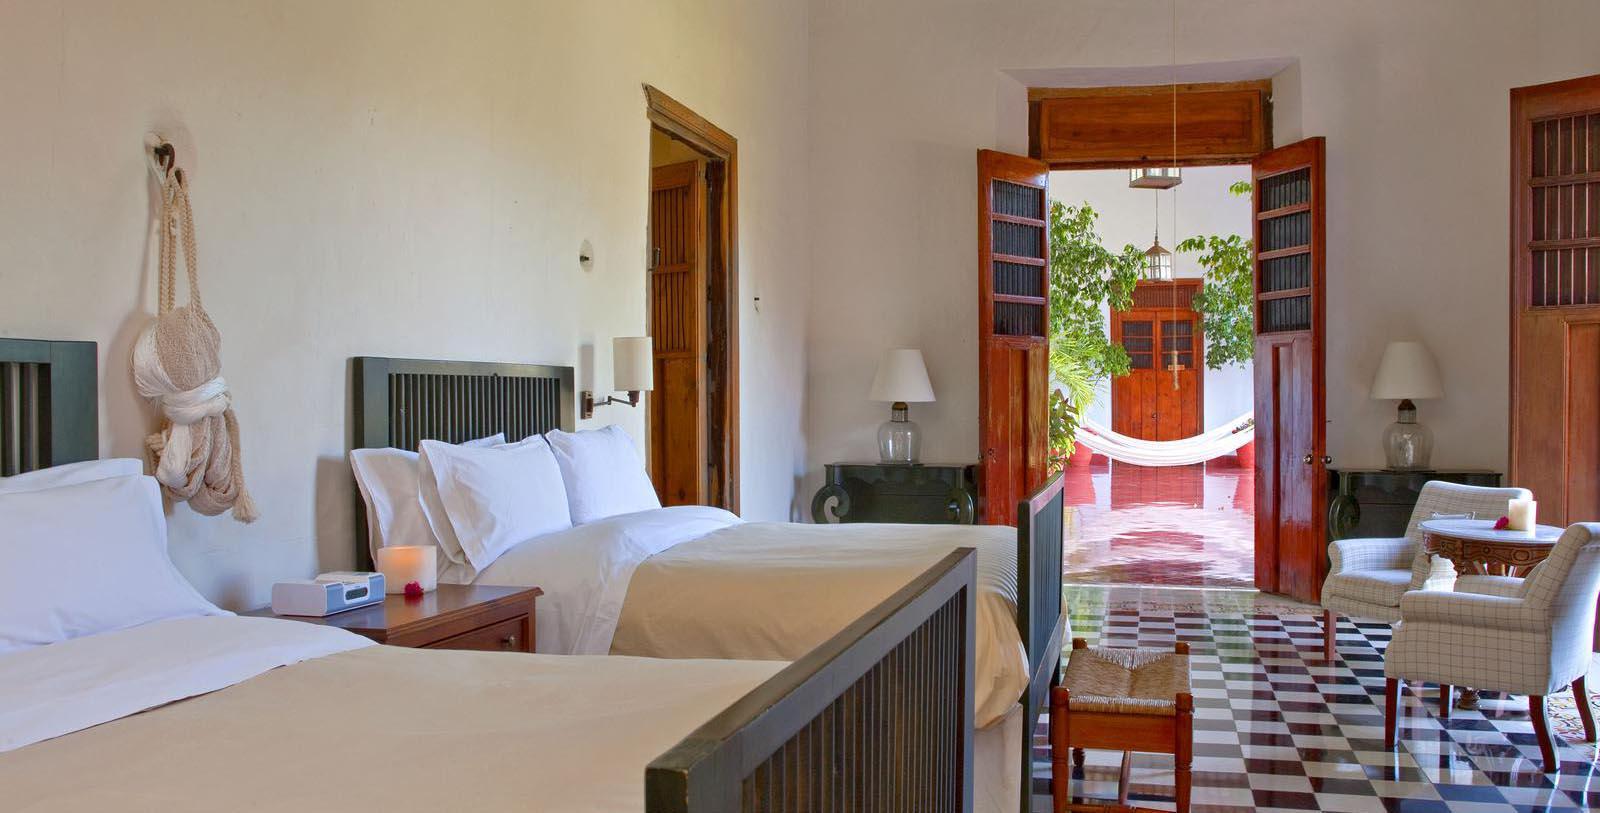 Image of Guestroom Interior, Hacienda Temozon, A Luxury Collection Hotel, Temozon Sur, Mexico, 1655, Member of Historic Hotels Worldwide, Location Map